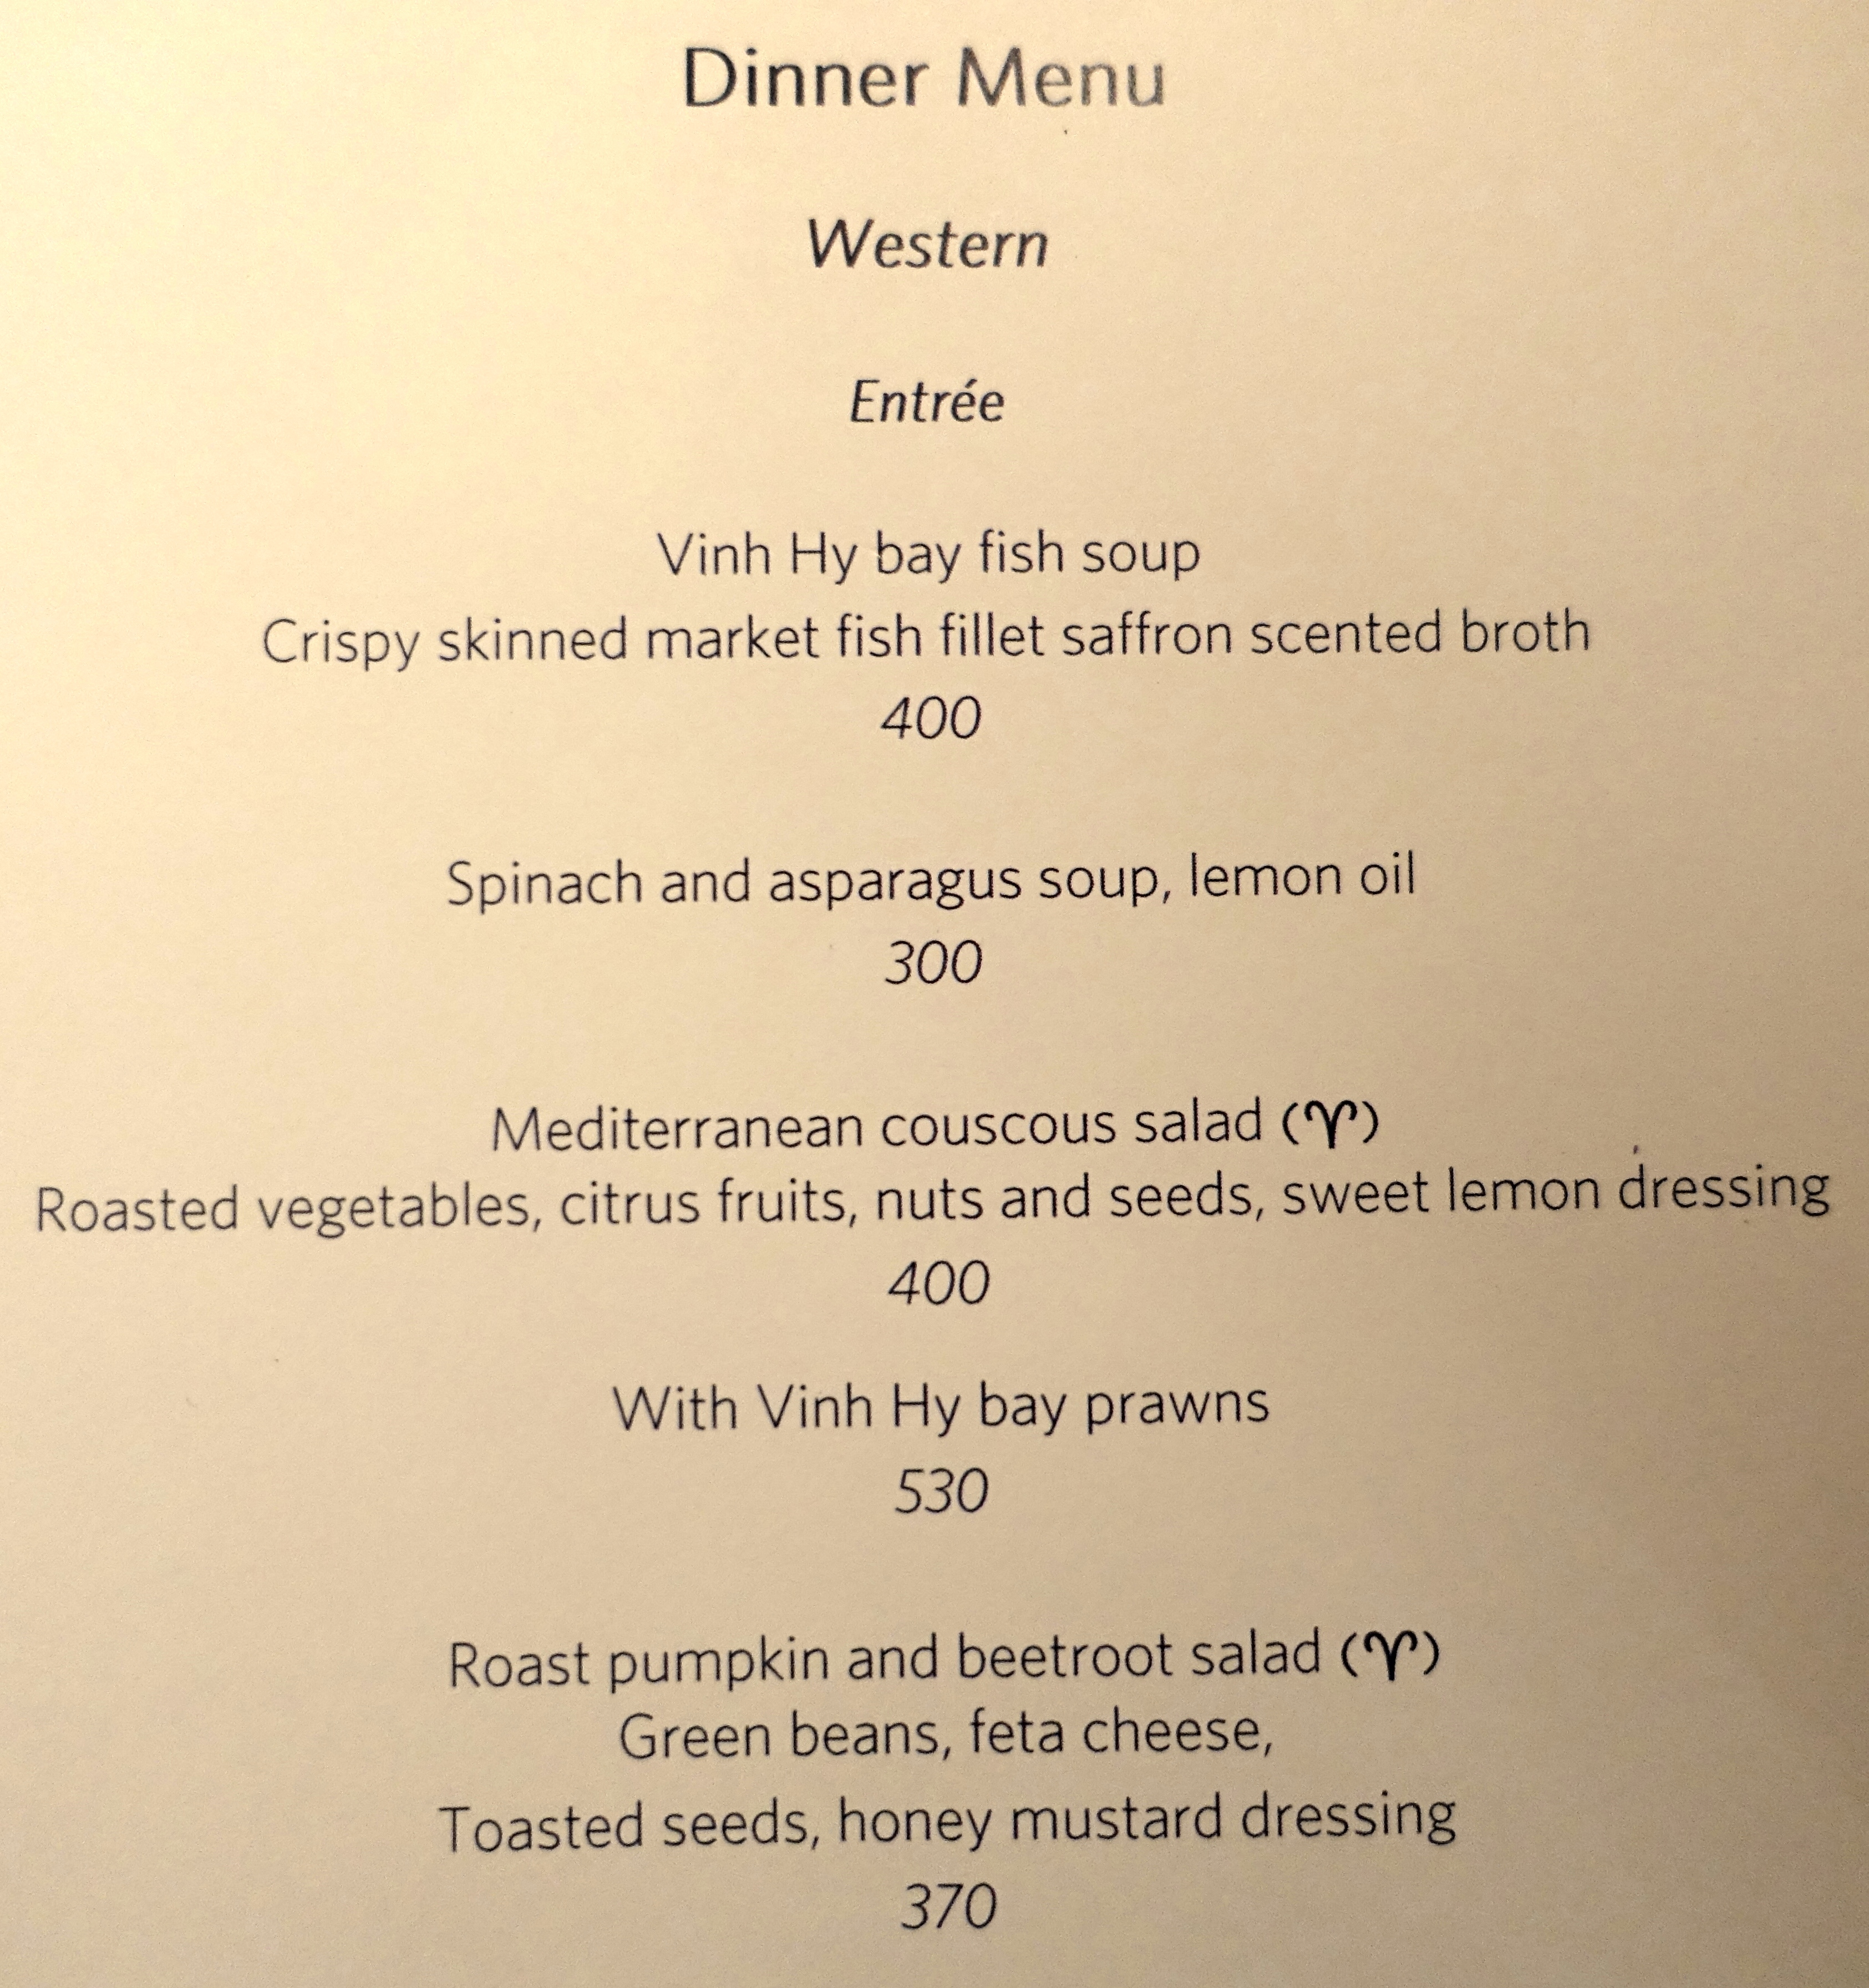 Amanoi Dinner Menu-Western Appetizers